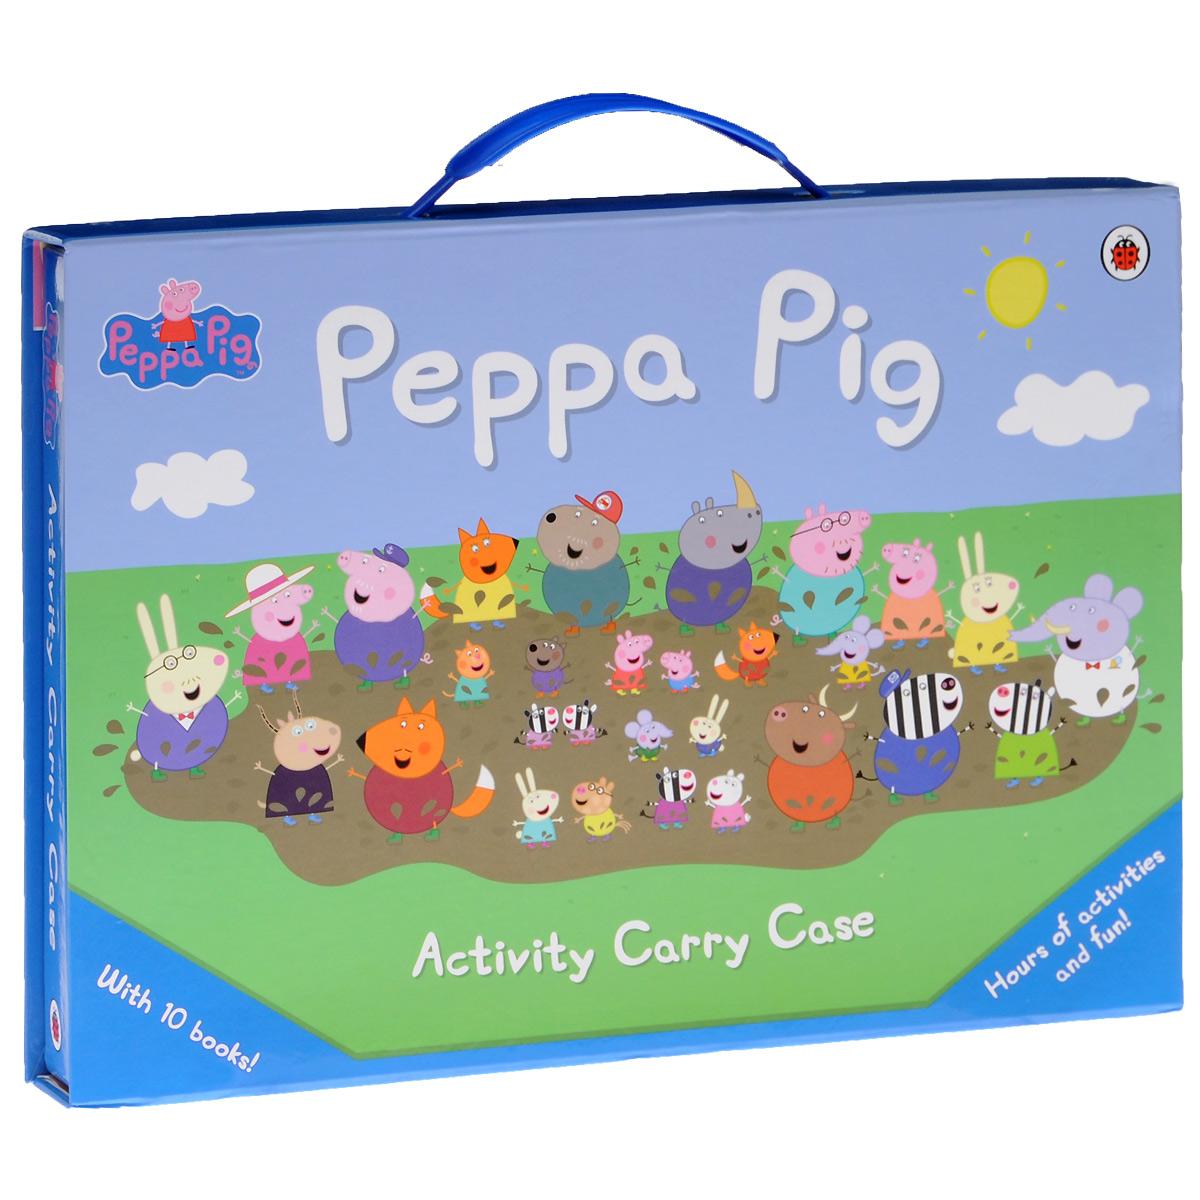 Peppa Pig: Activity Carry Case (комплект из 10 книг)